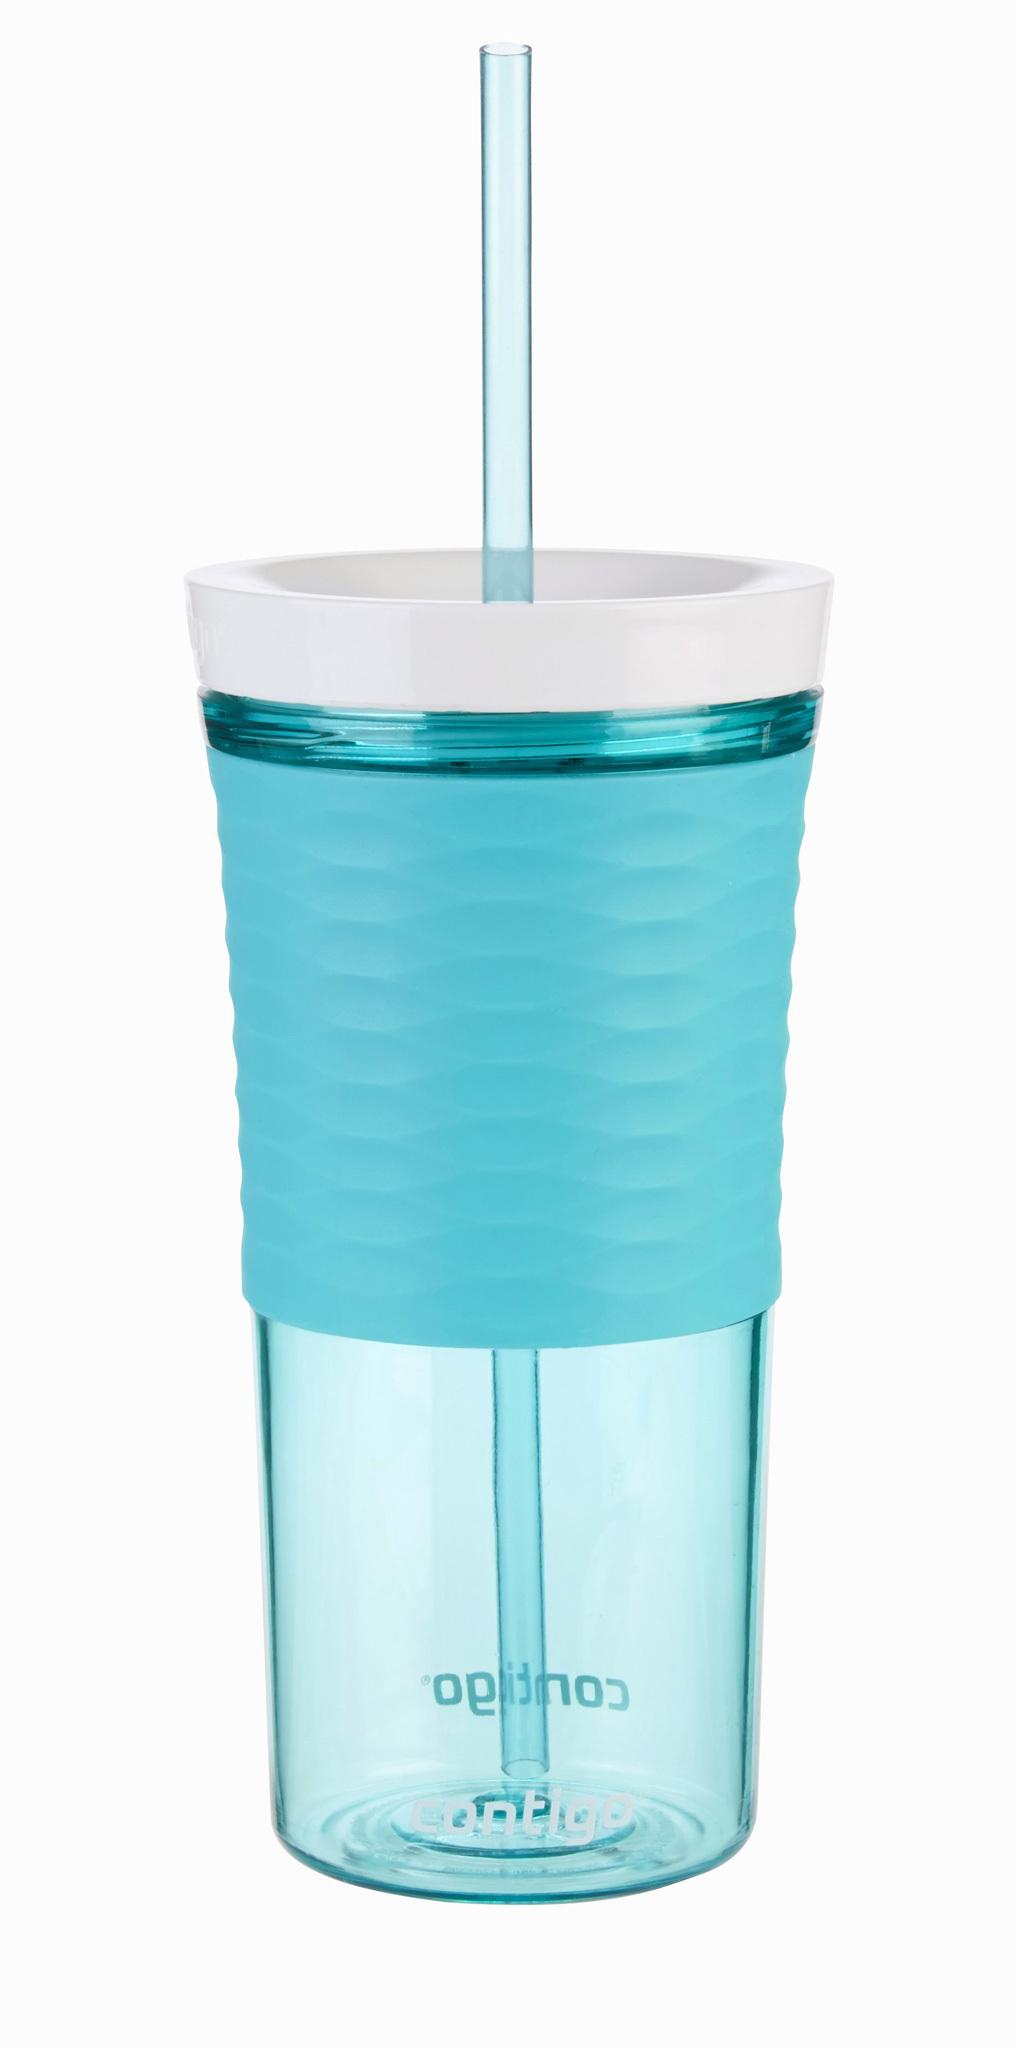 Стакан-шейкер Contigo (0.53 литра) голубой contigo0327